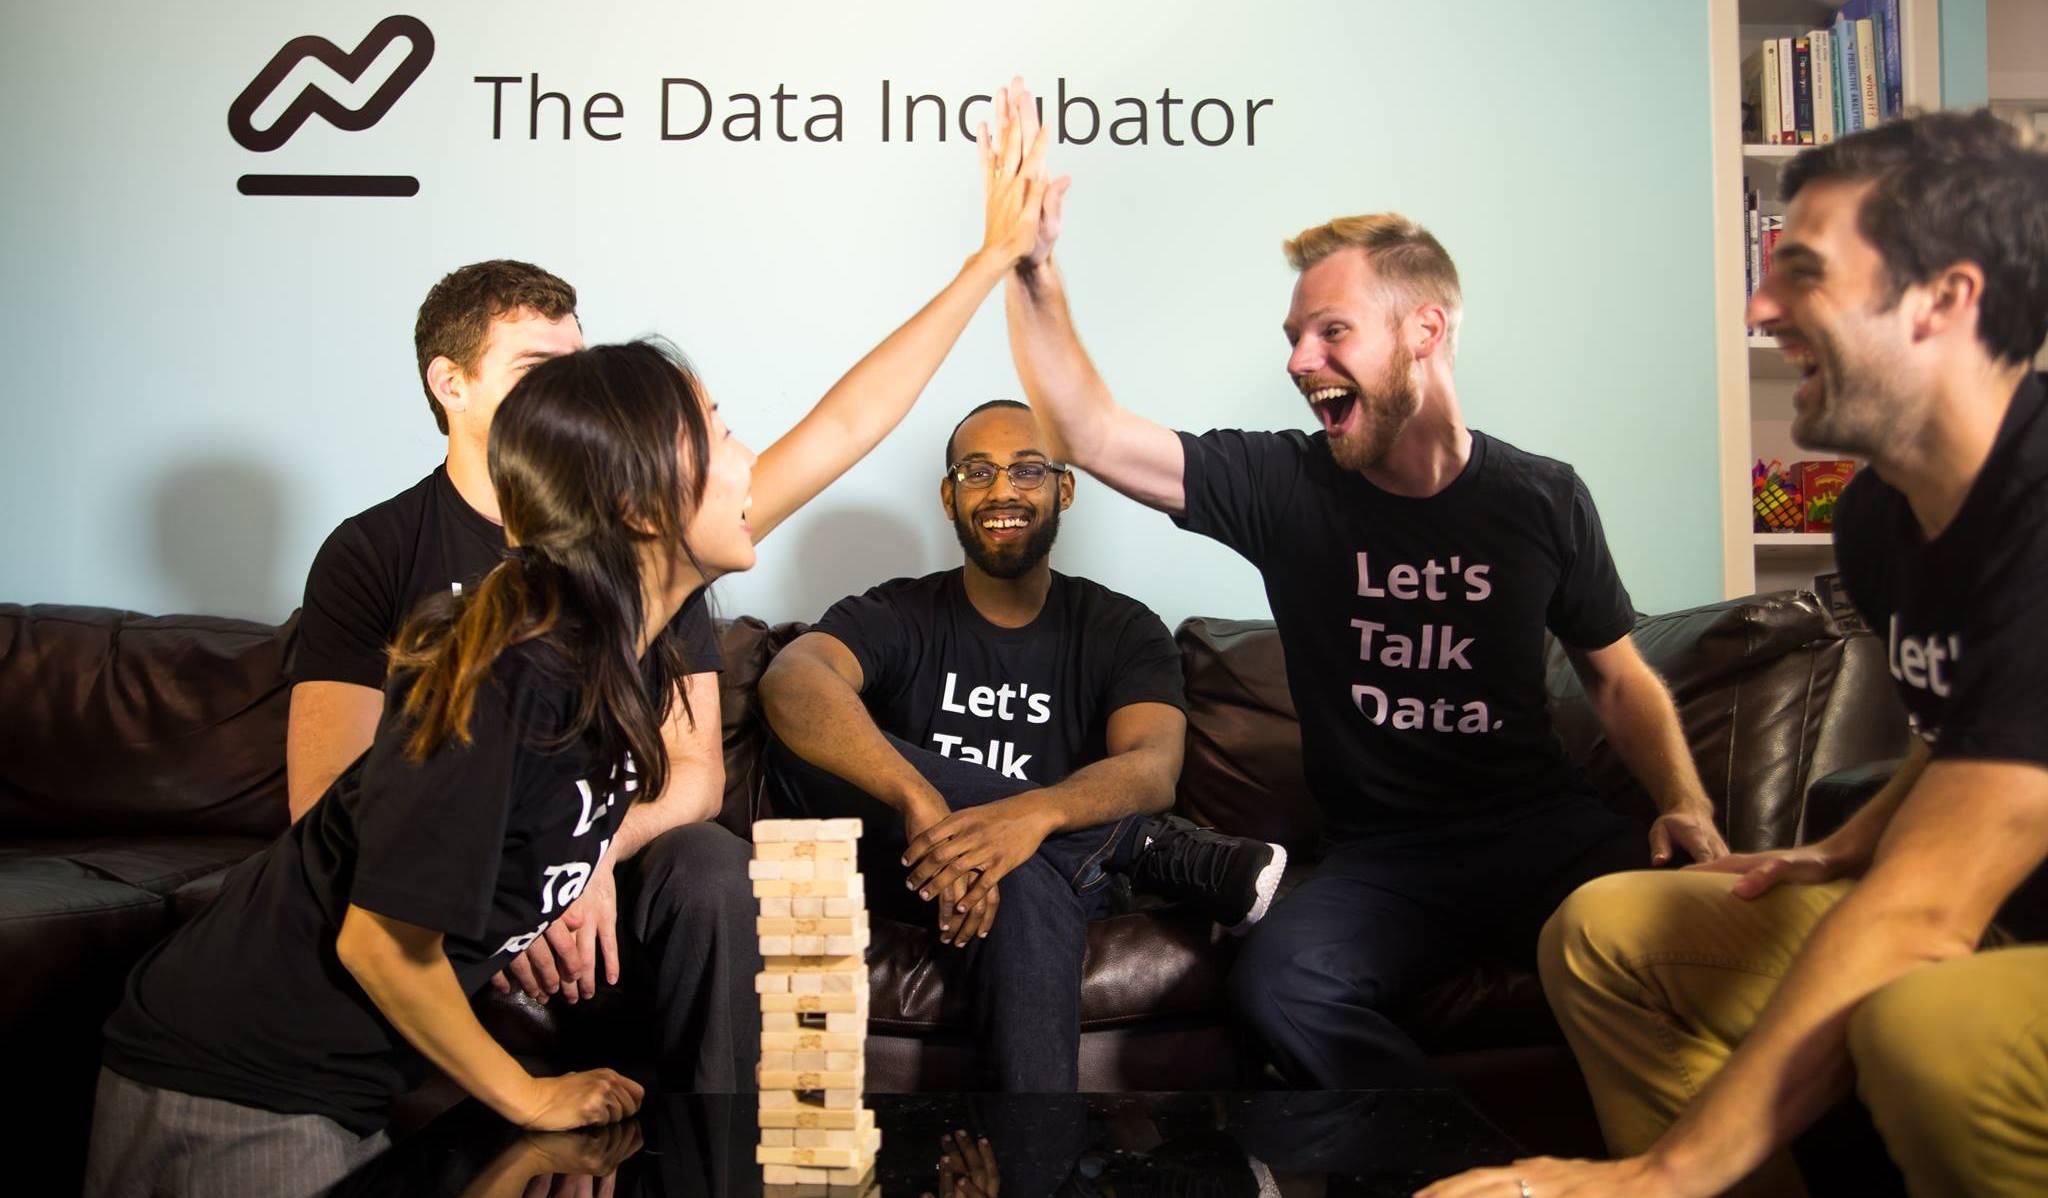 Apply for the Data Incubator – Data Science Fellowship 2018